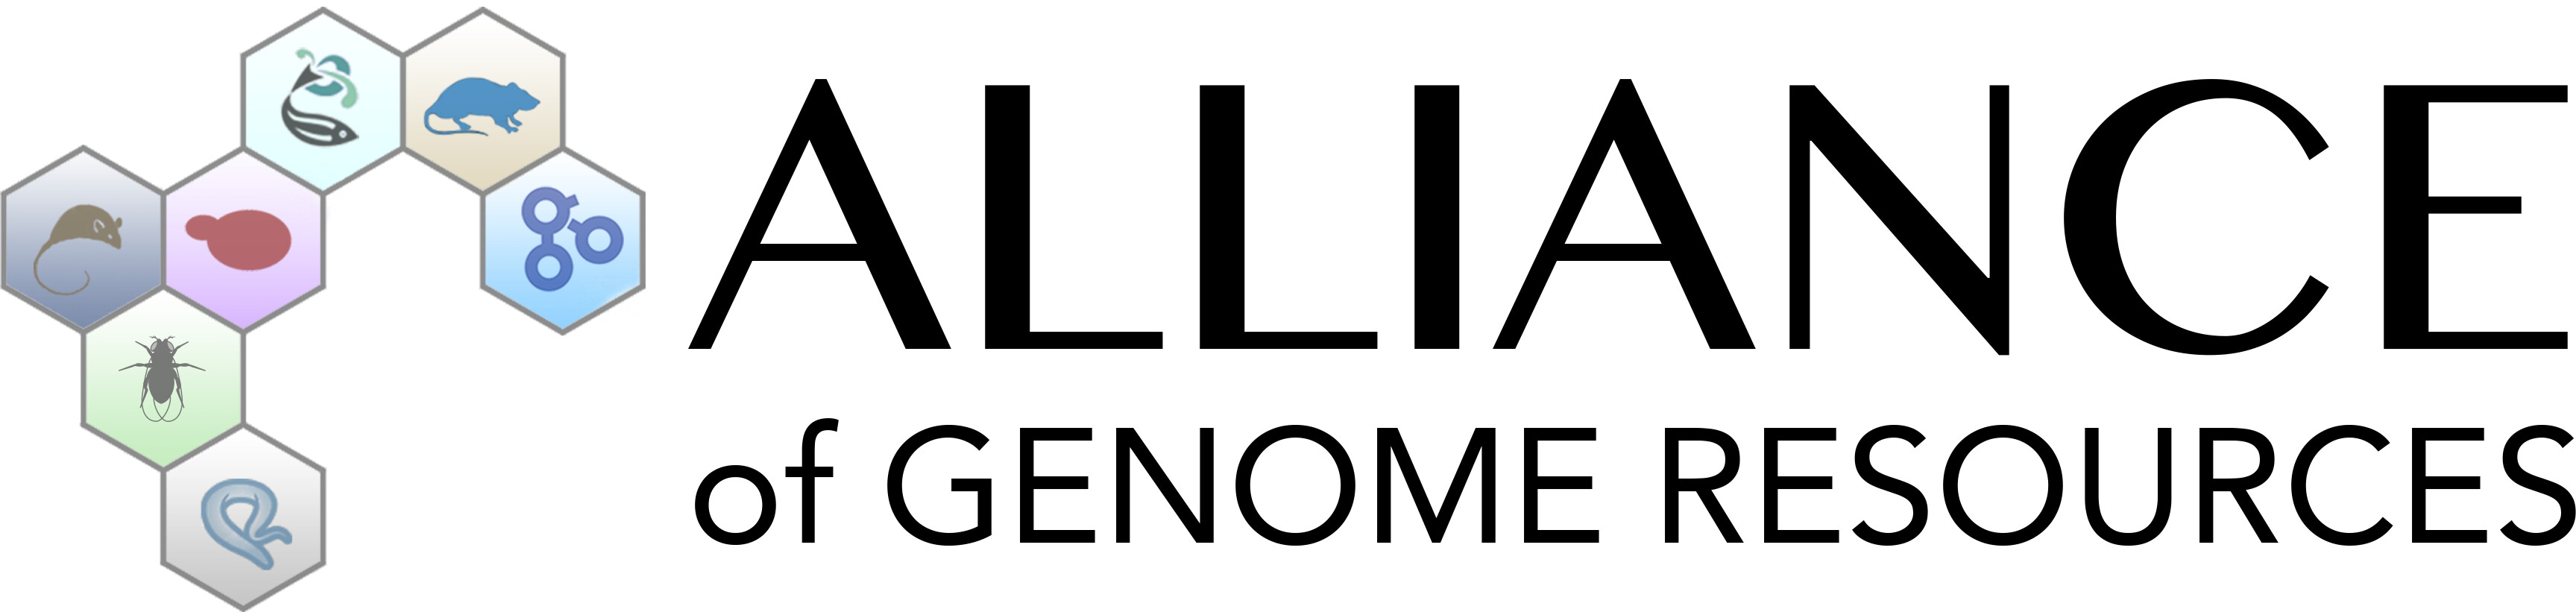 Alliance of Genome Resources Community Forum